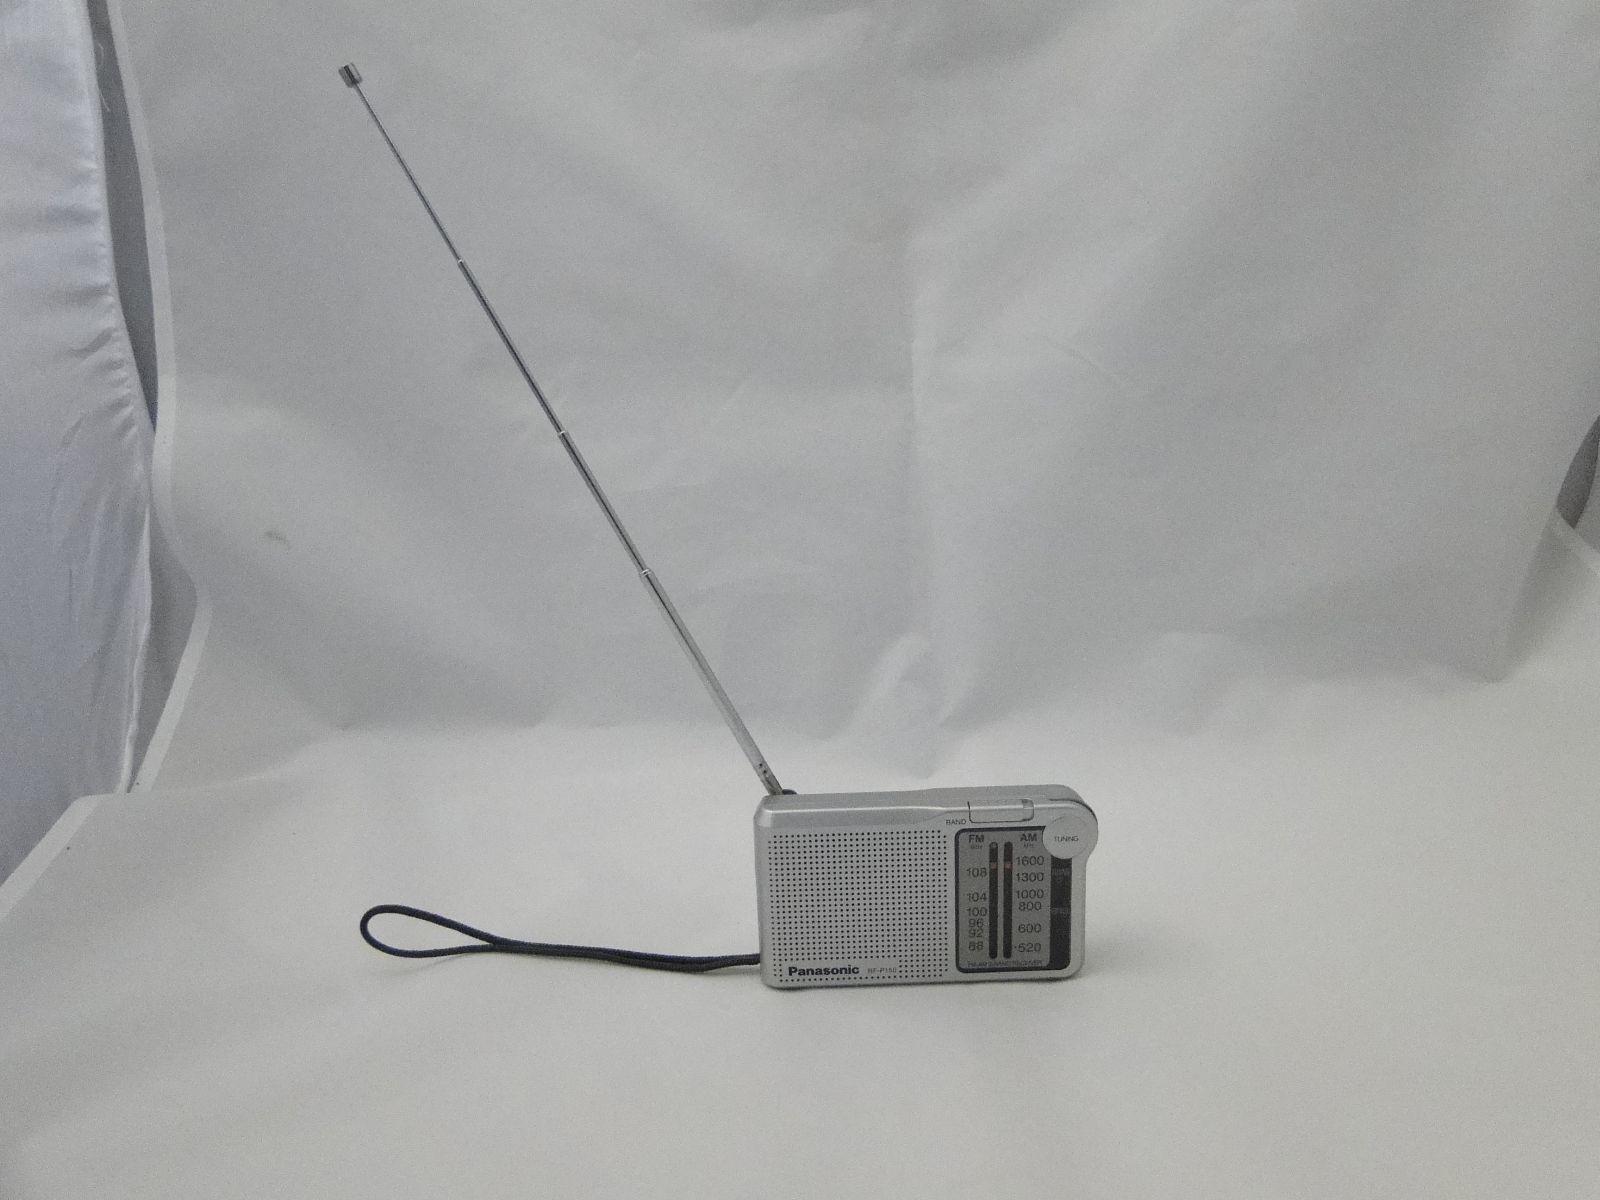 DSC08665.JPG (1600×1200)